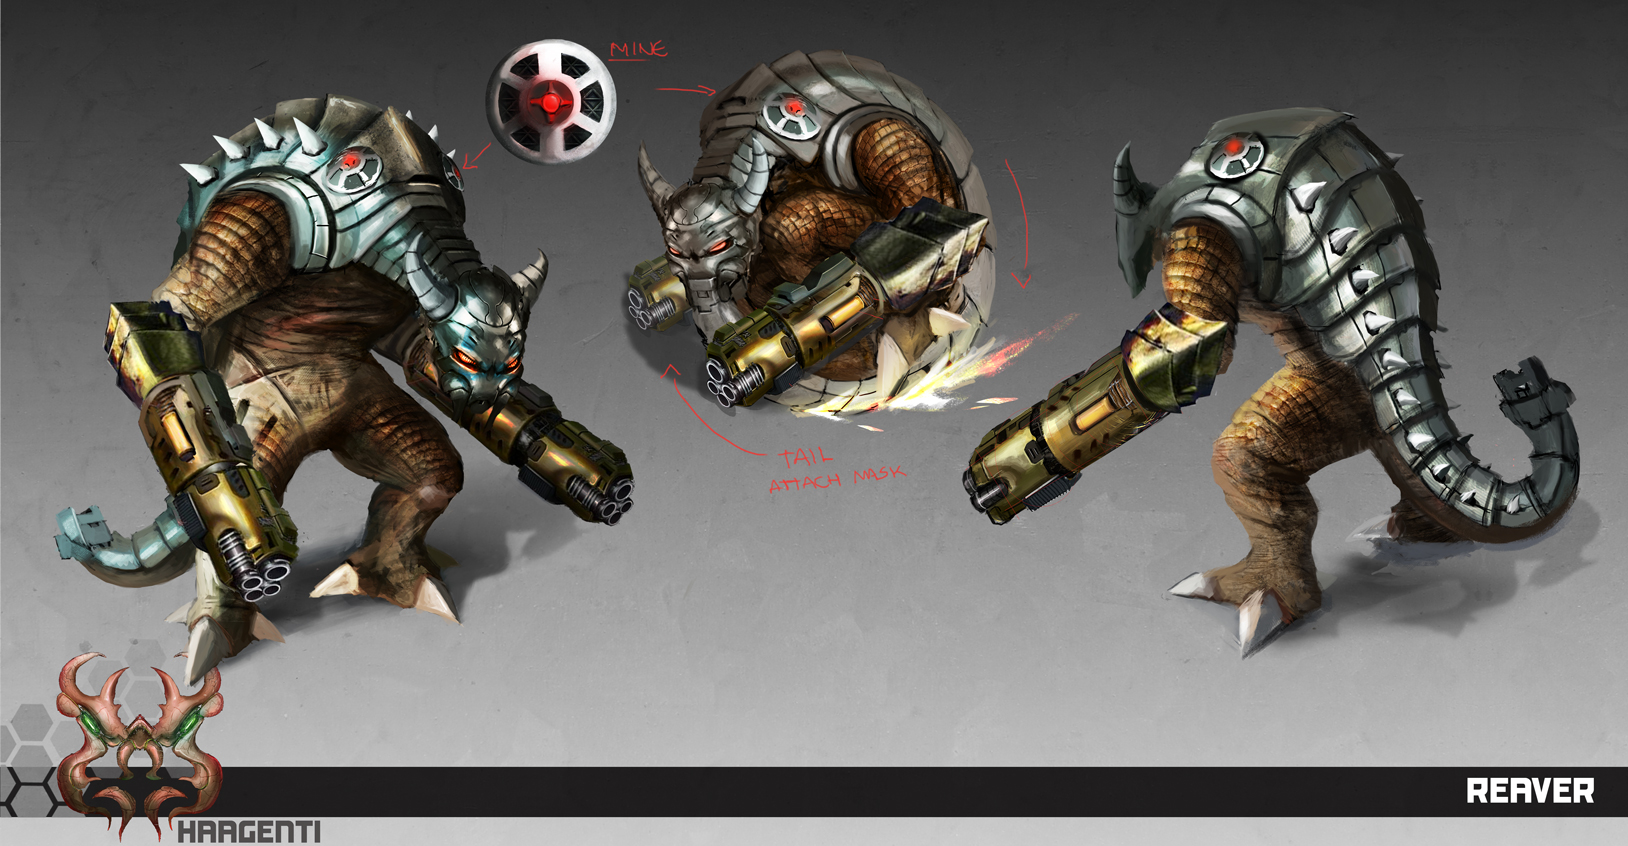 Reaver Concept